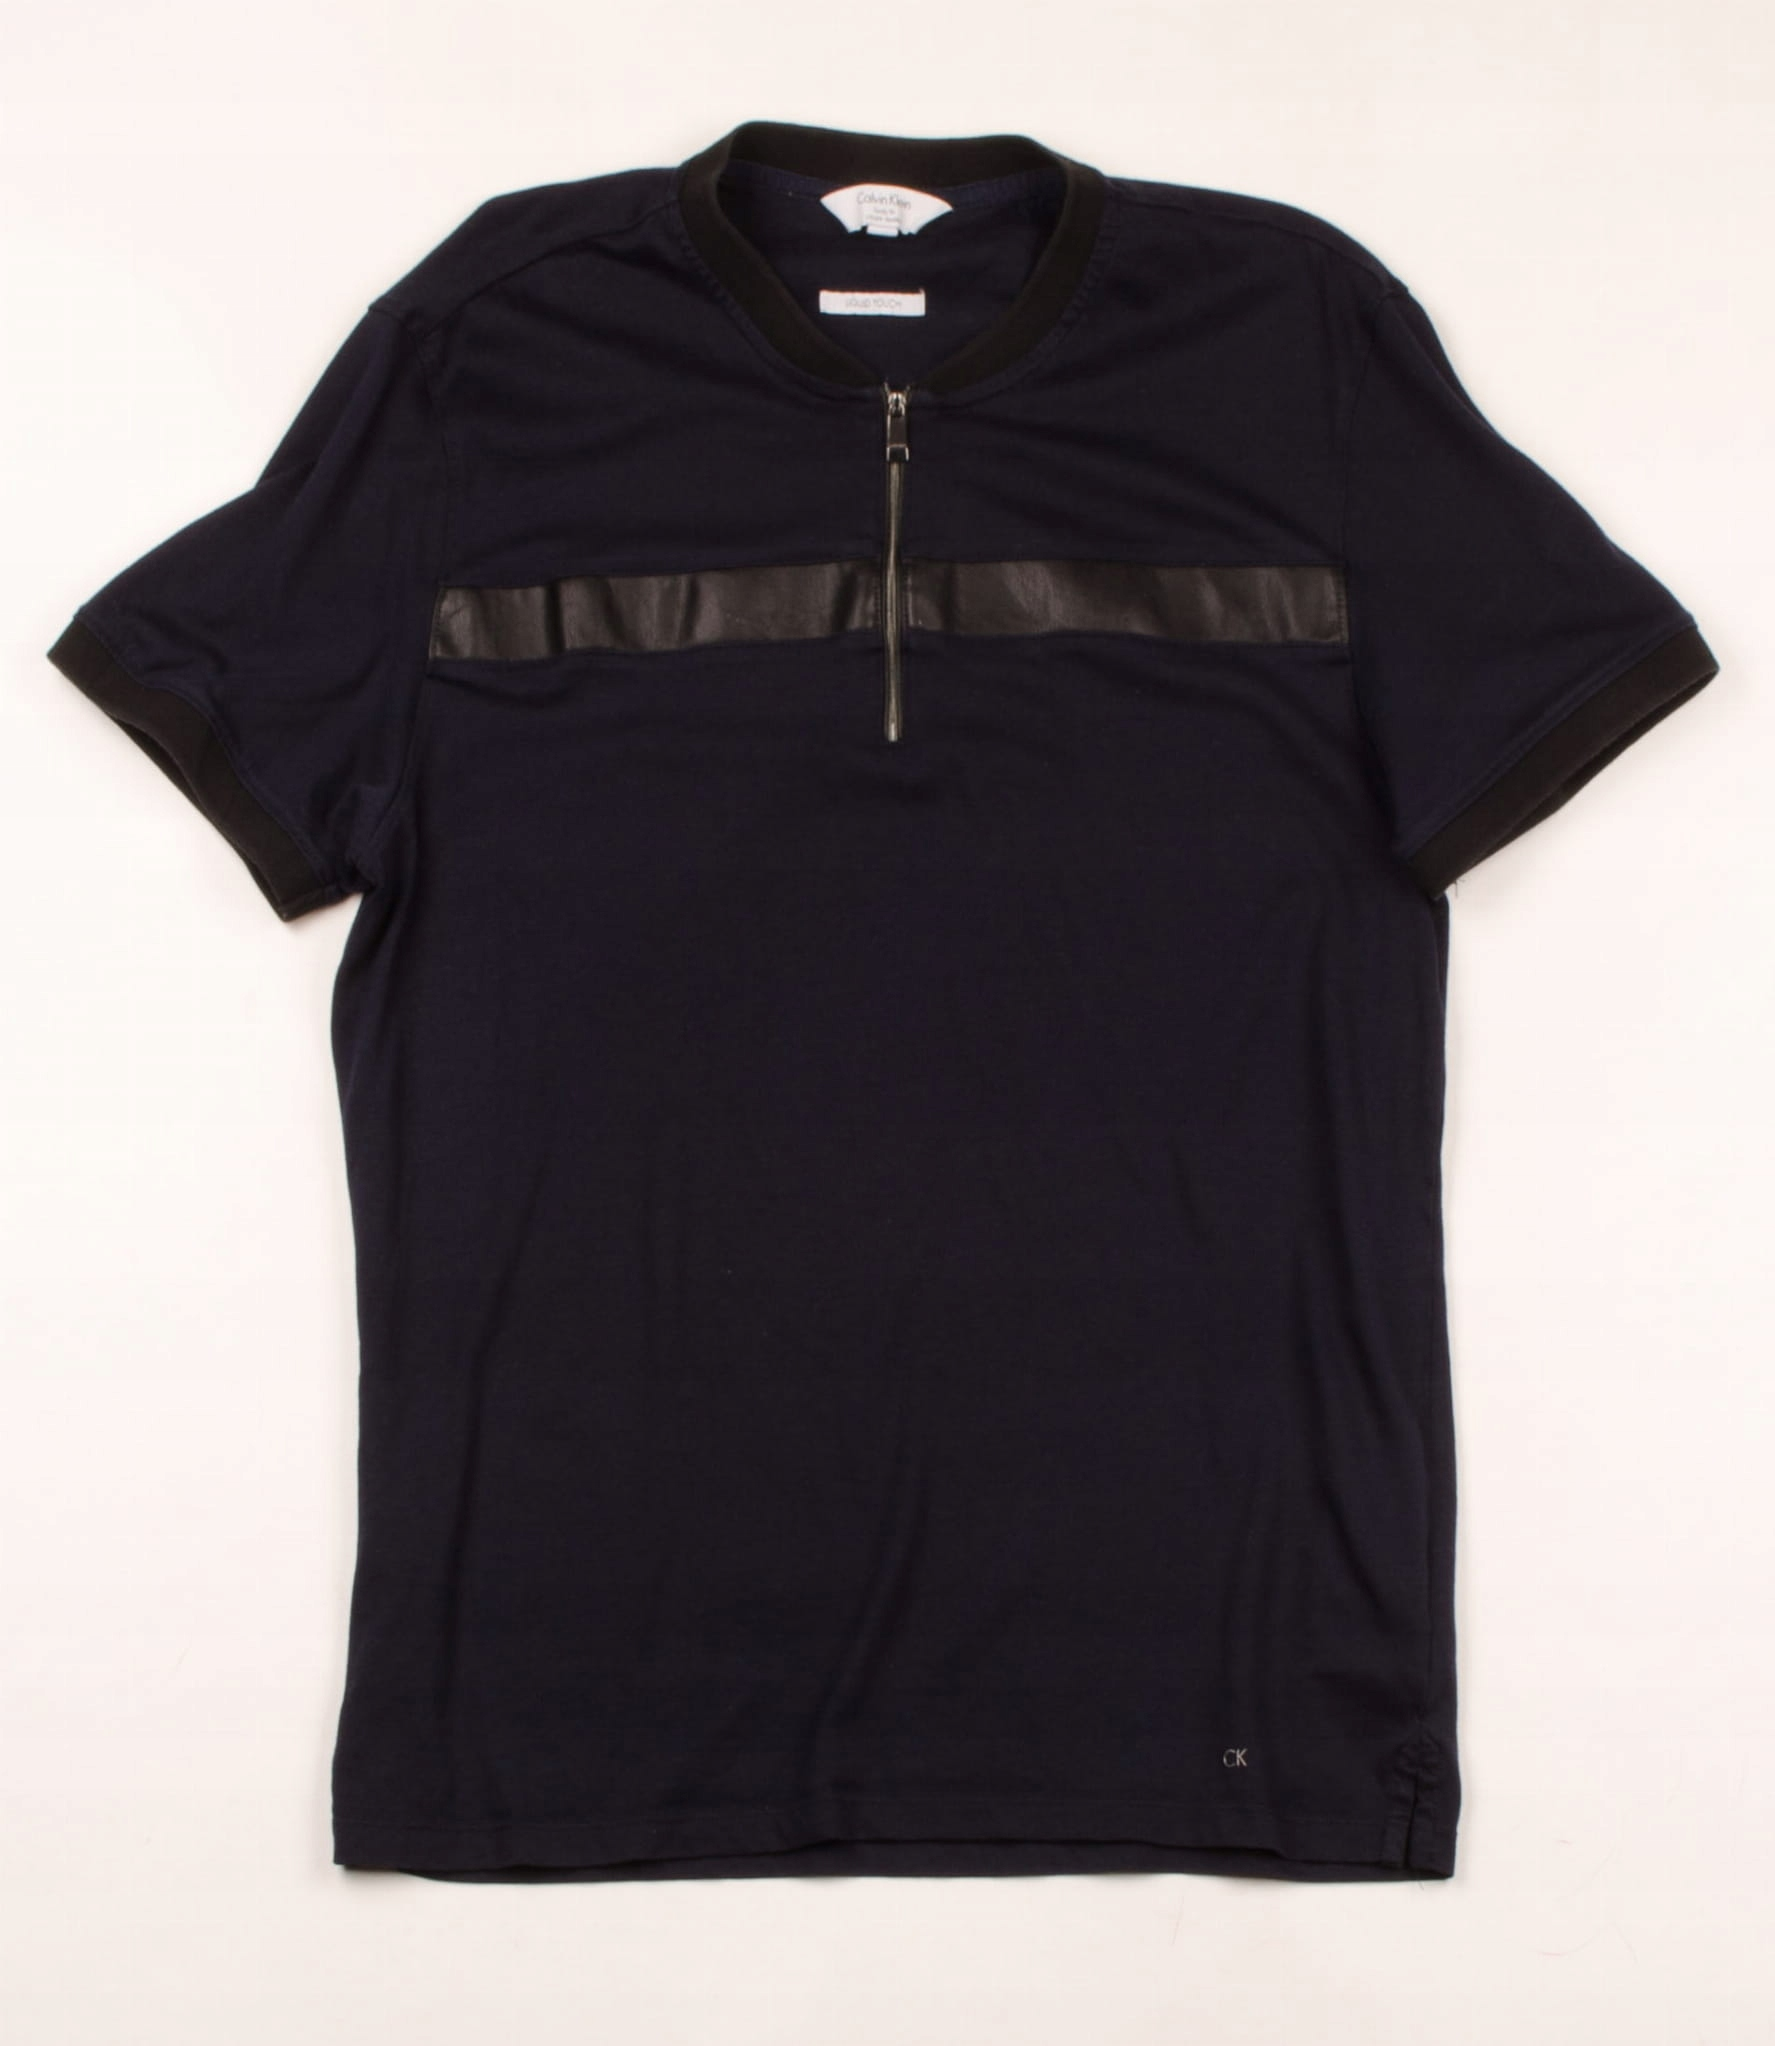 37853 Calvin Klein T-shirt Koszulka Męska XL